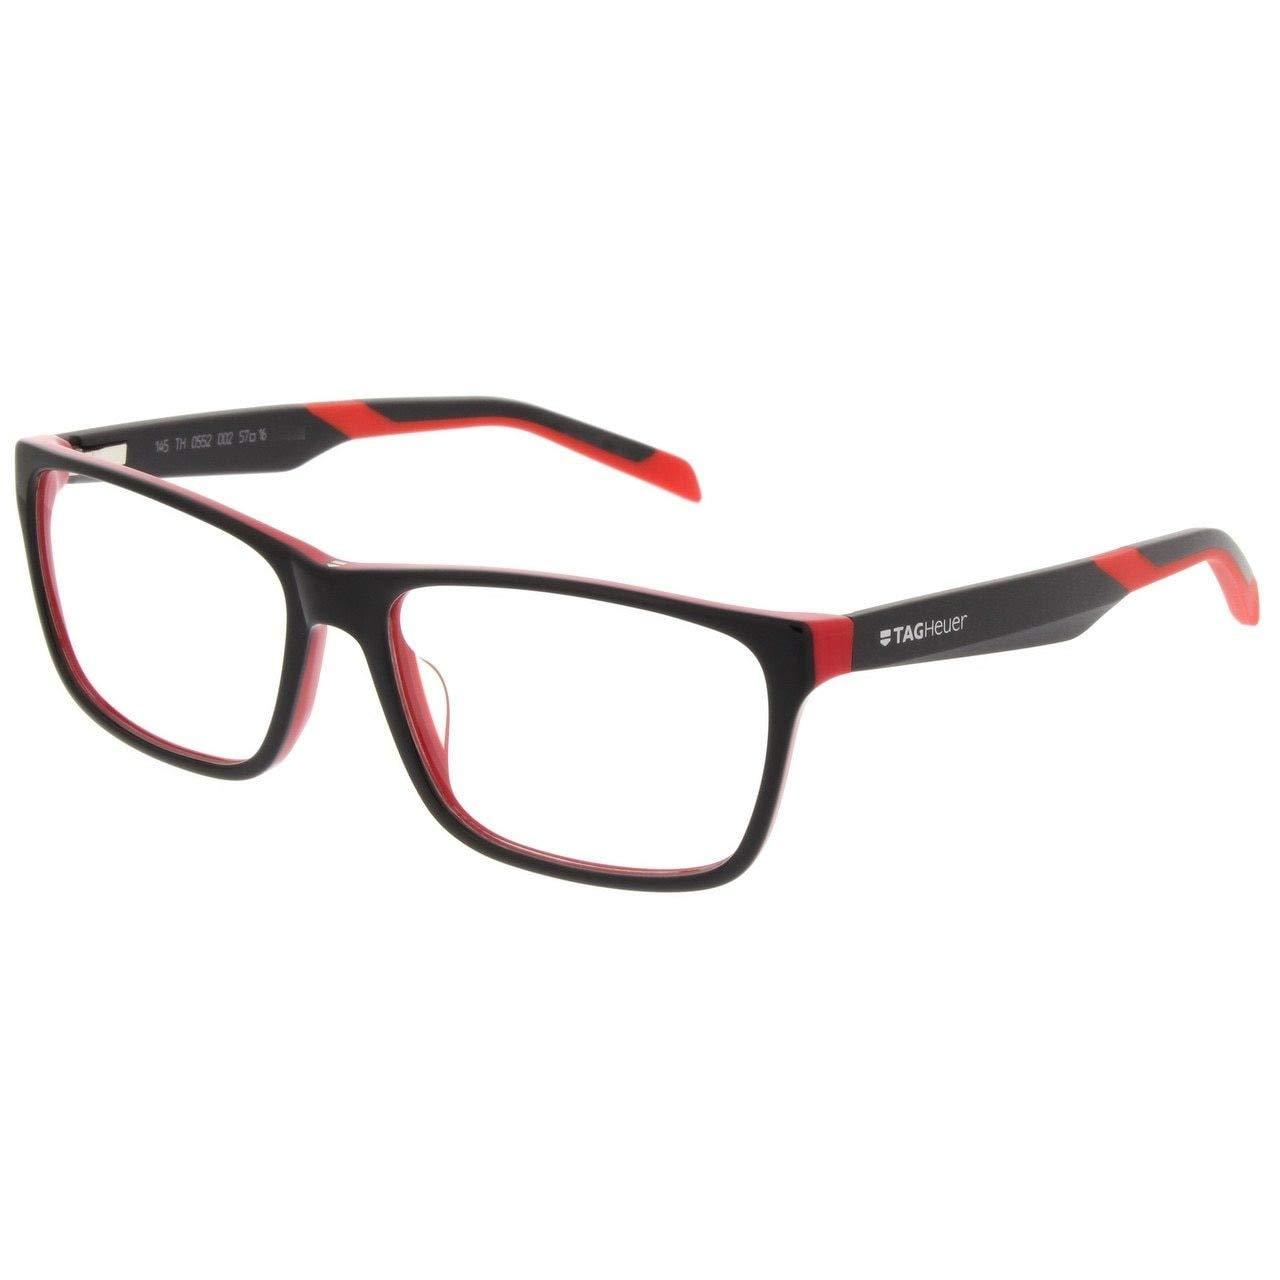 Tag Heuer 0552 Eyeglasses 002ブラック/レッド57 mm   B01A7PEM88